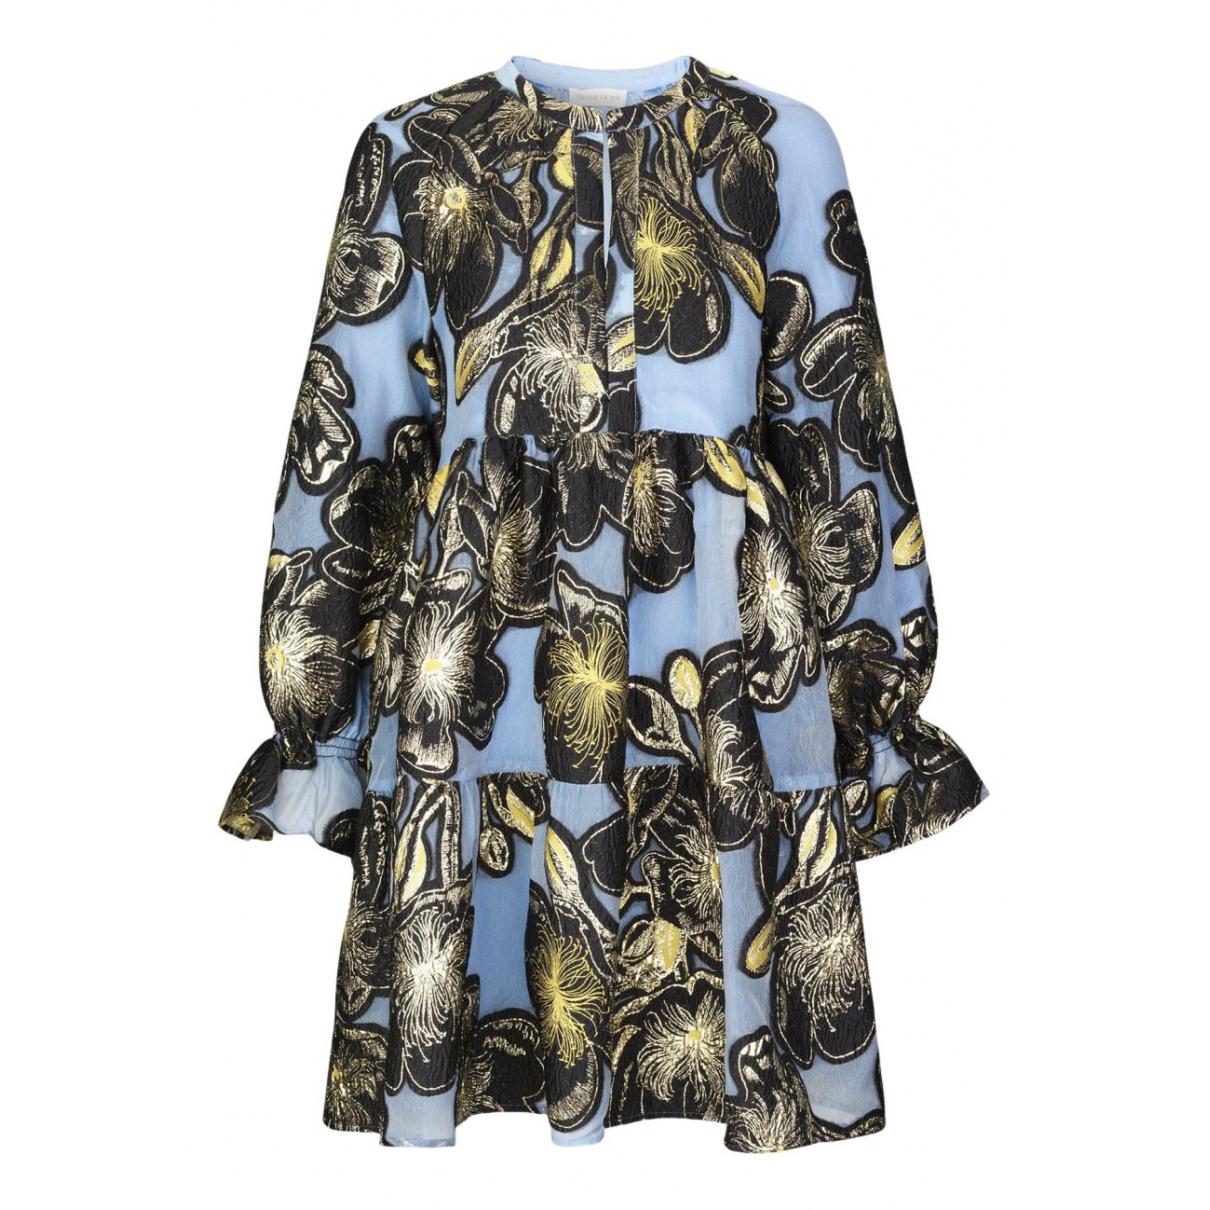 Stine Goya \N Kleid in  Bunt Polyester